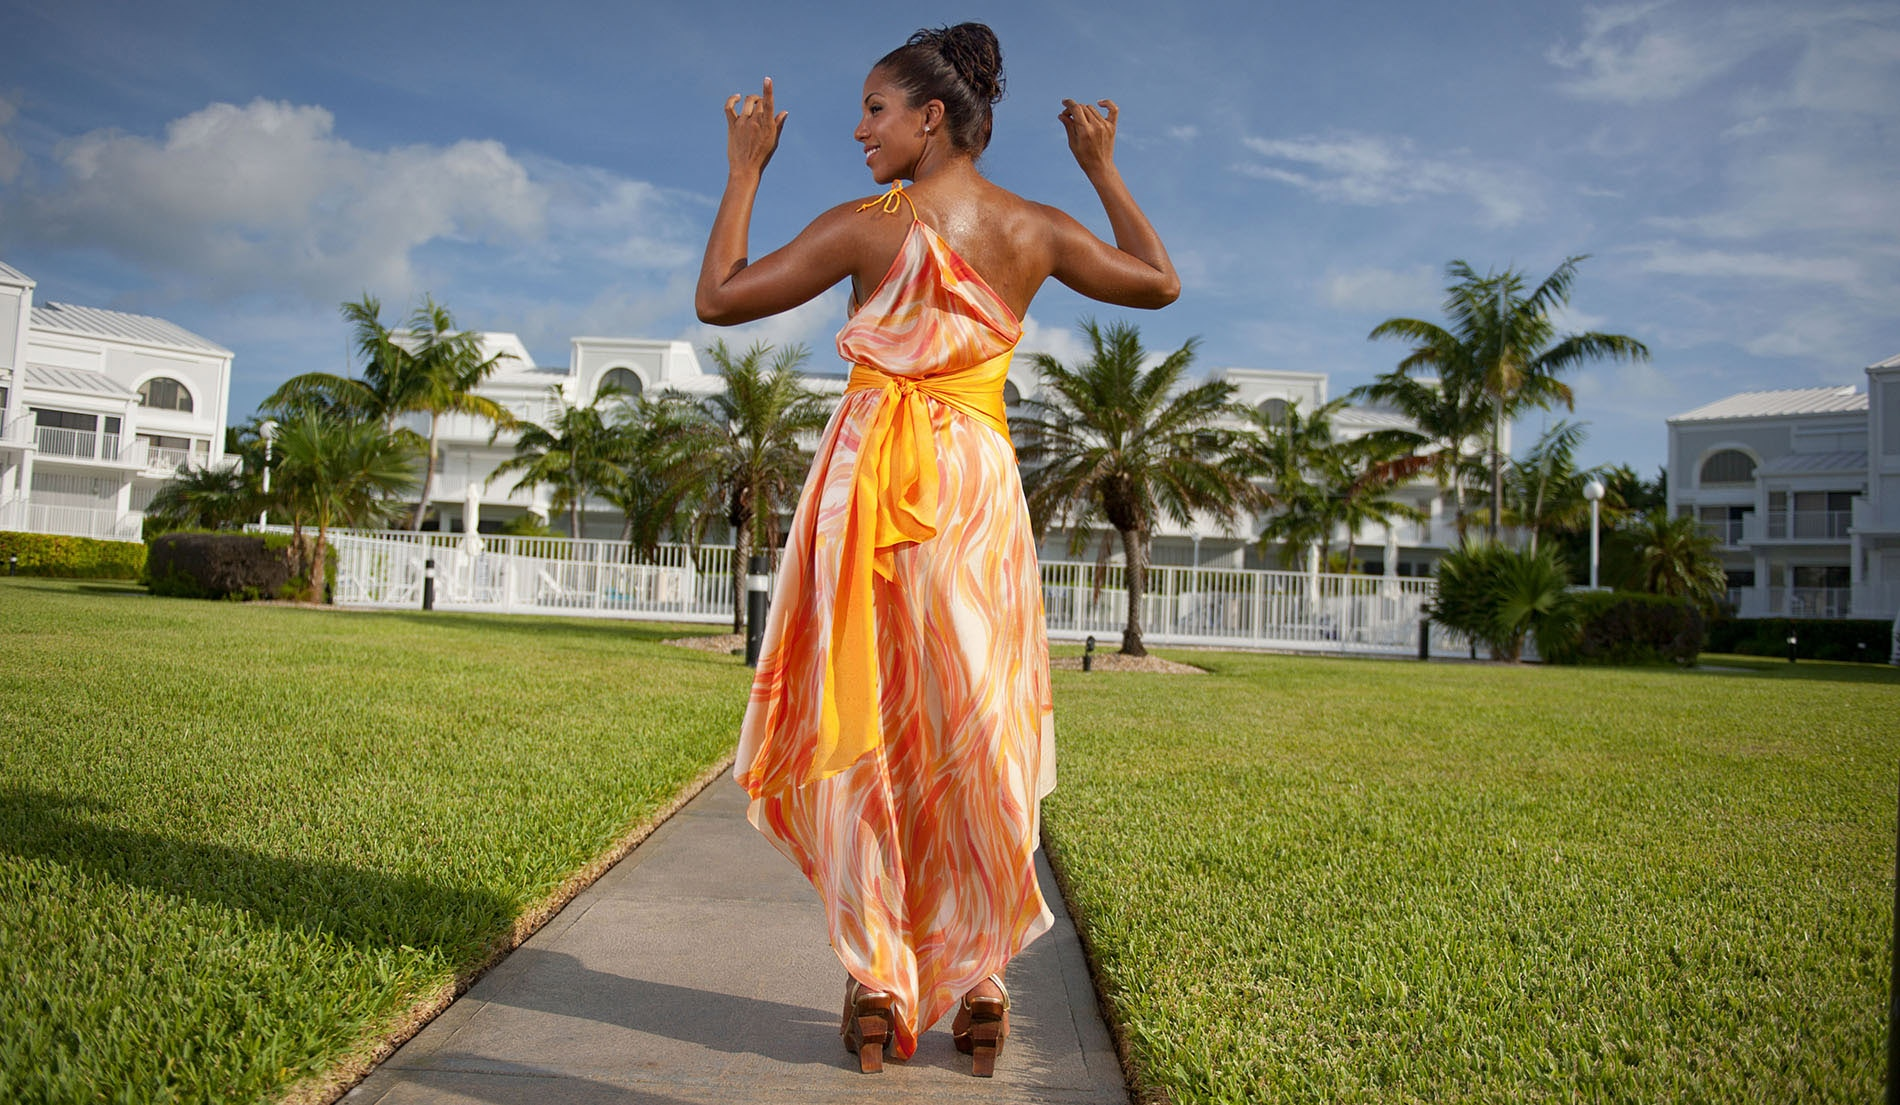 Asymmetric Waist one shoulder beach wedding dress - Look Book for Aruba - Look 2 back